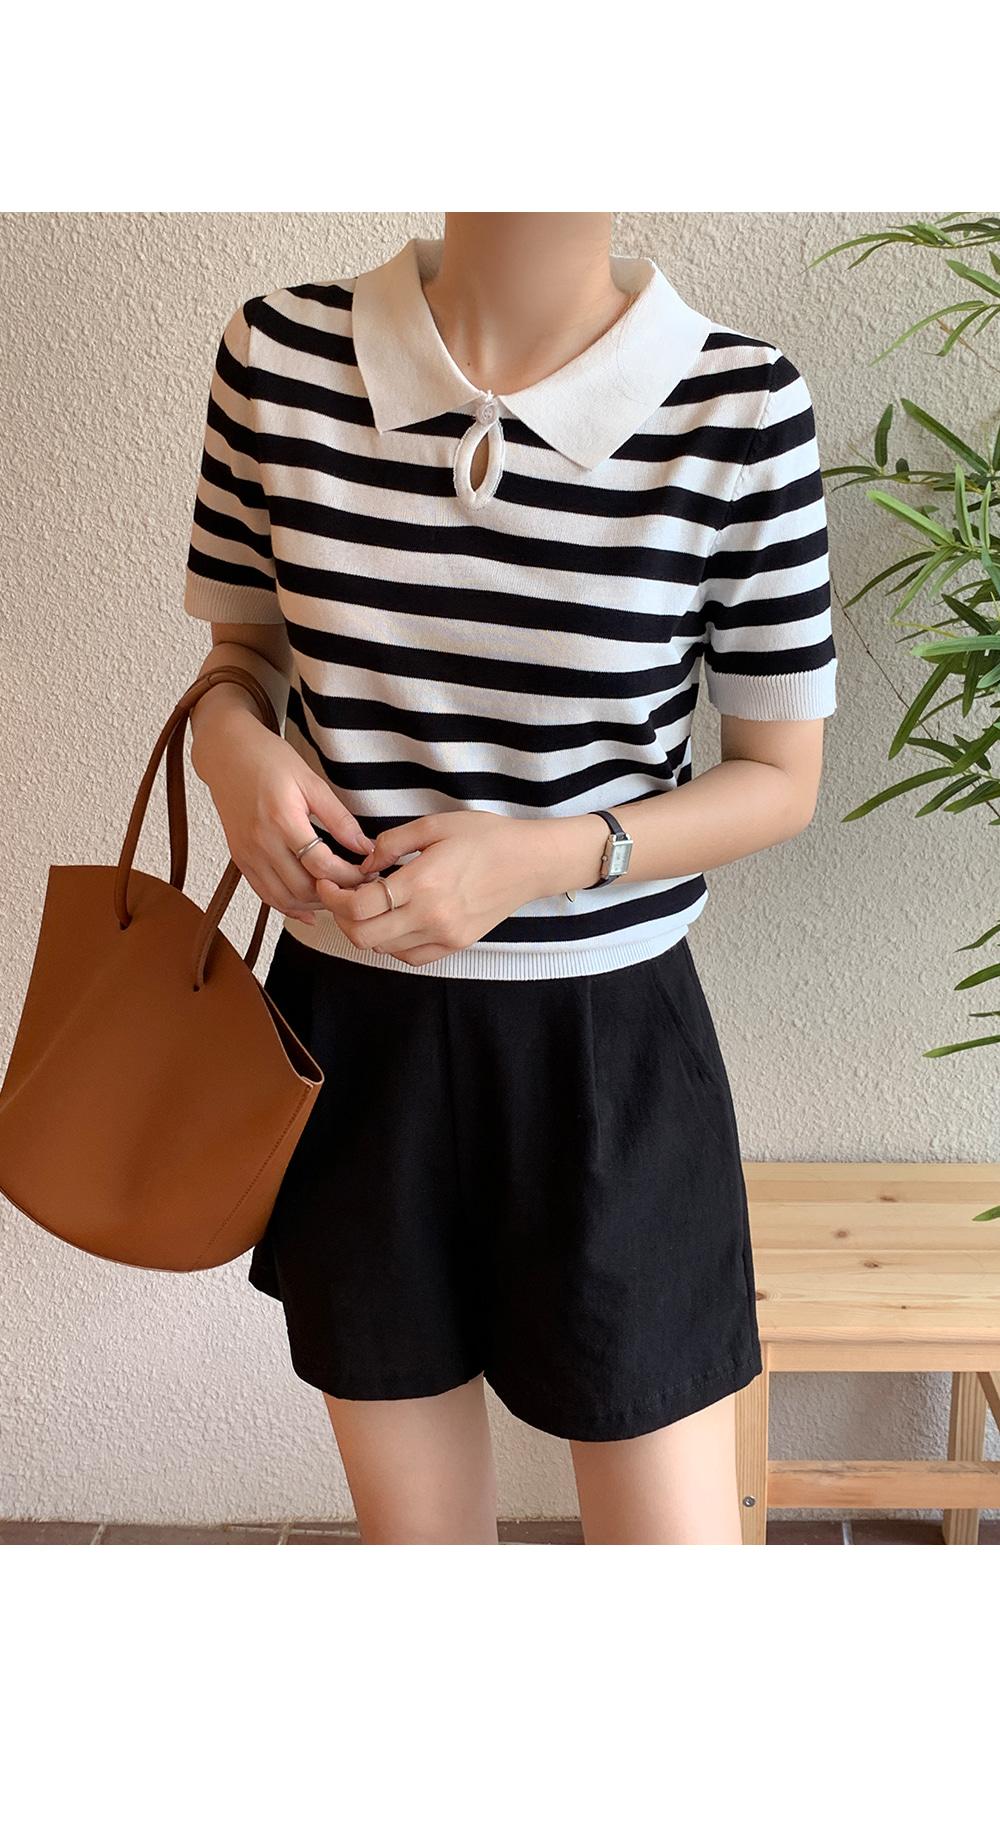 Black & White Stripe Knit Top-Holiholic